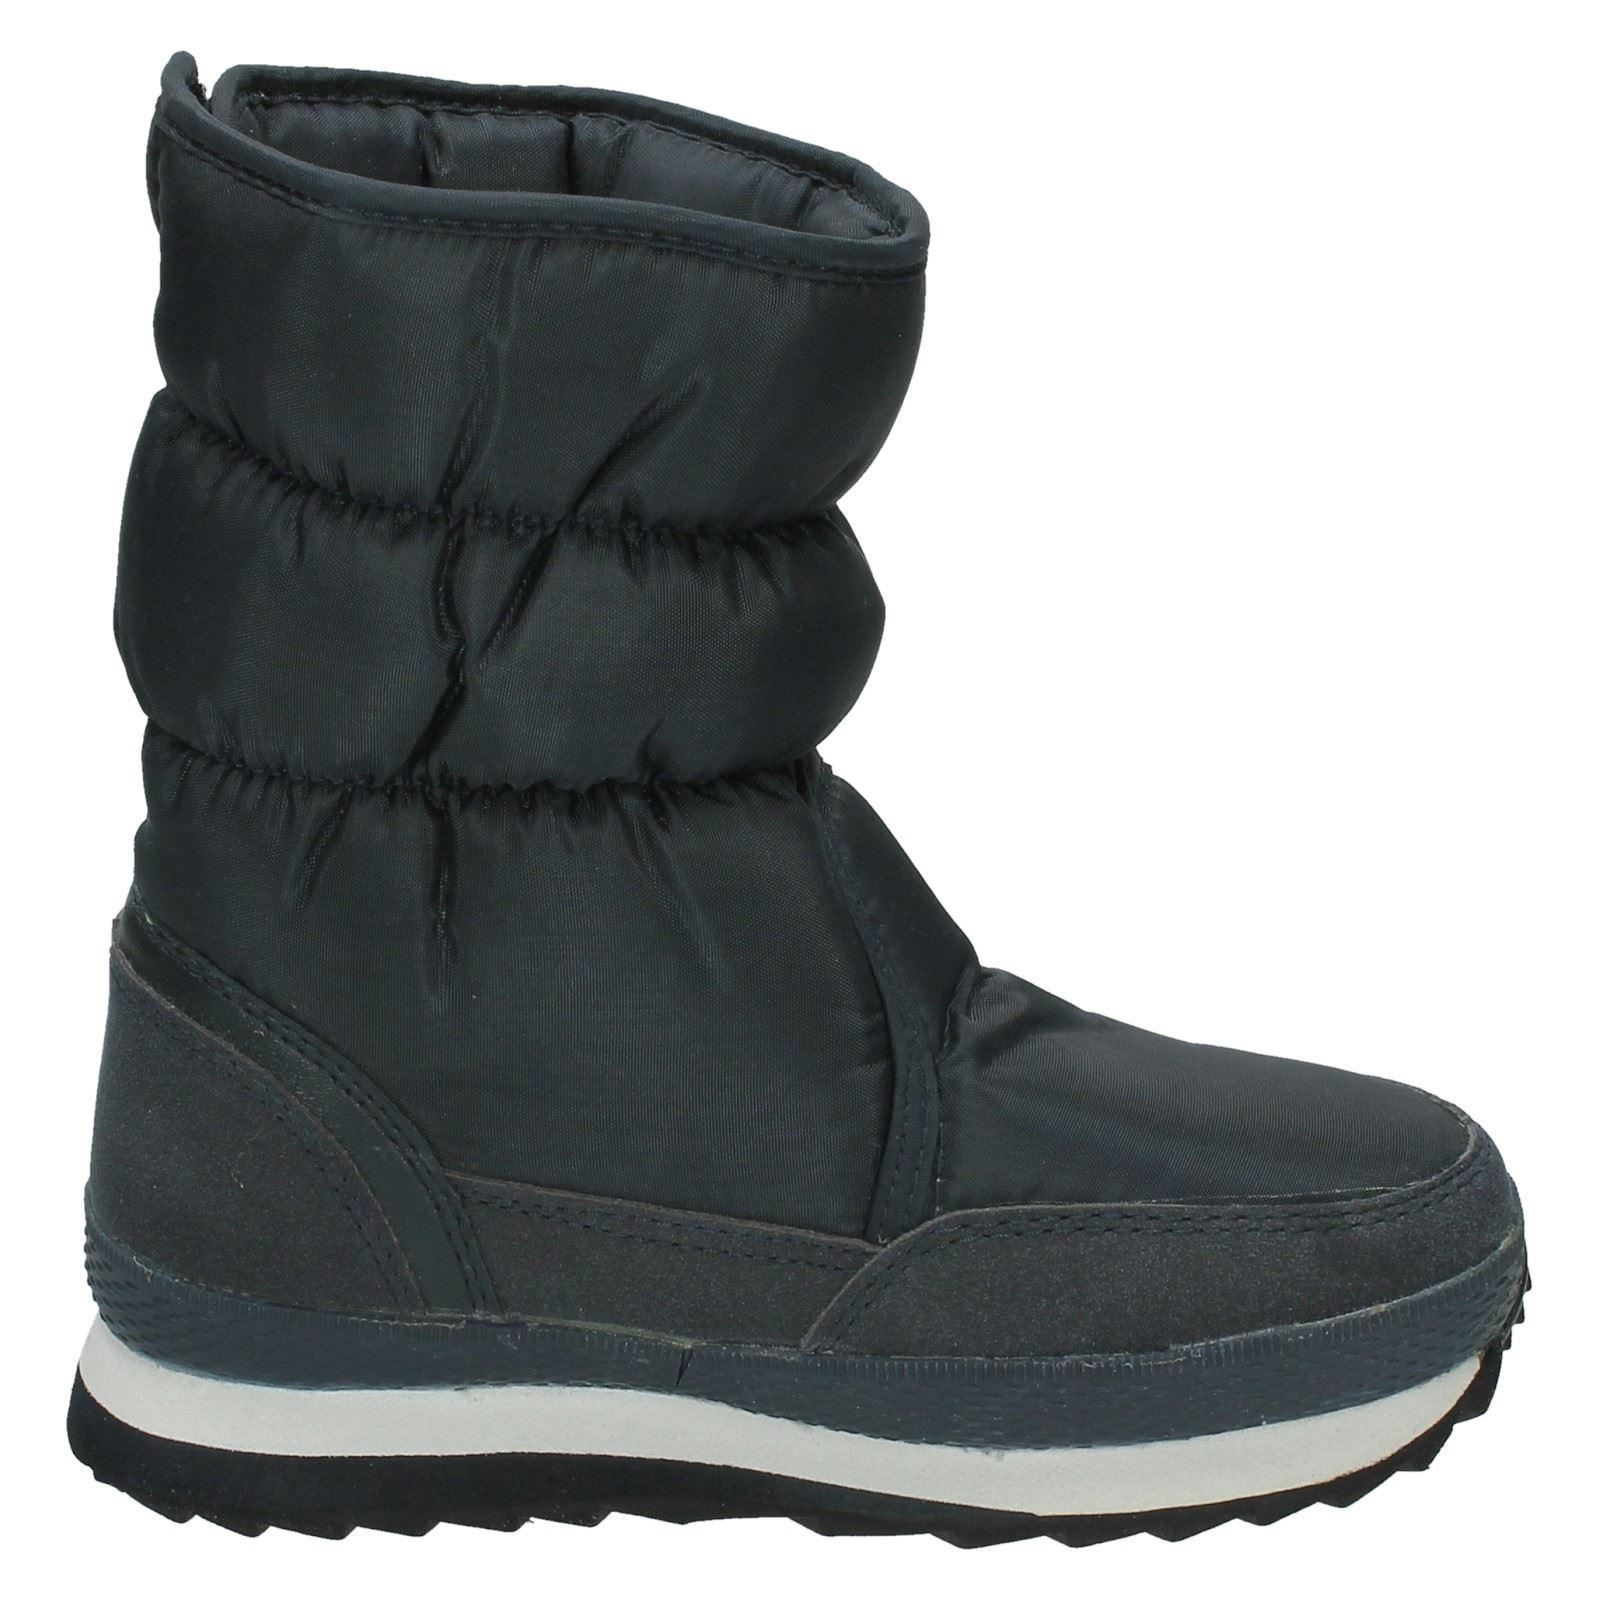 Unisex Childrens Nylon Hook /& Loop Fastened Reflex Snow Boots